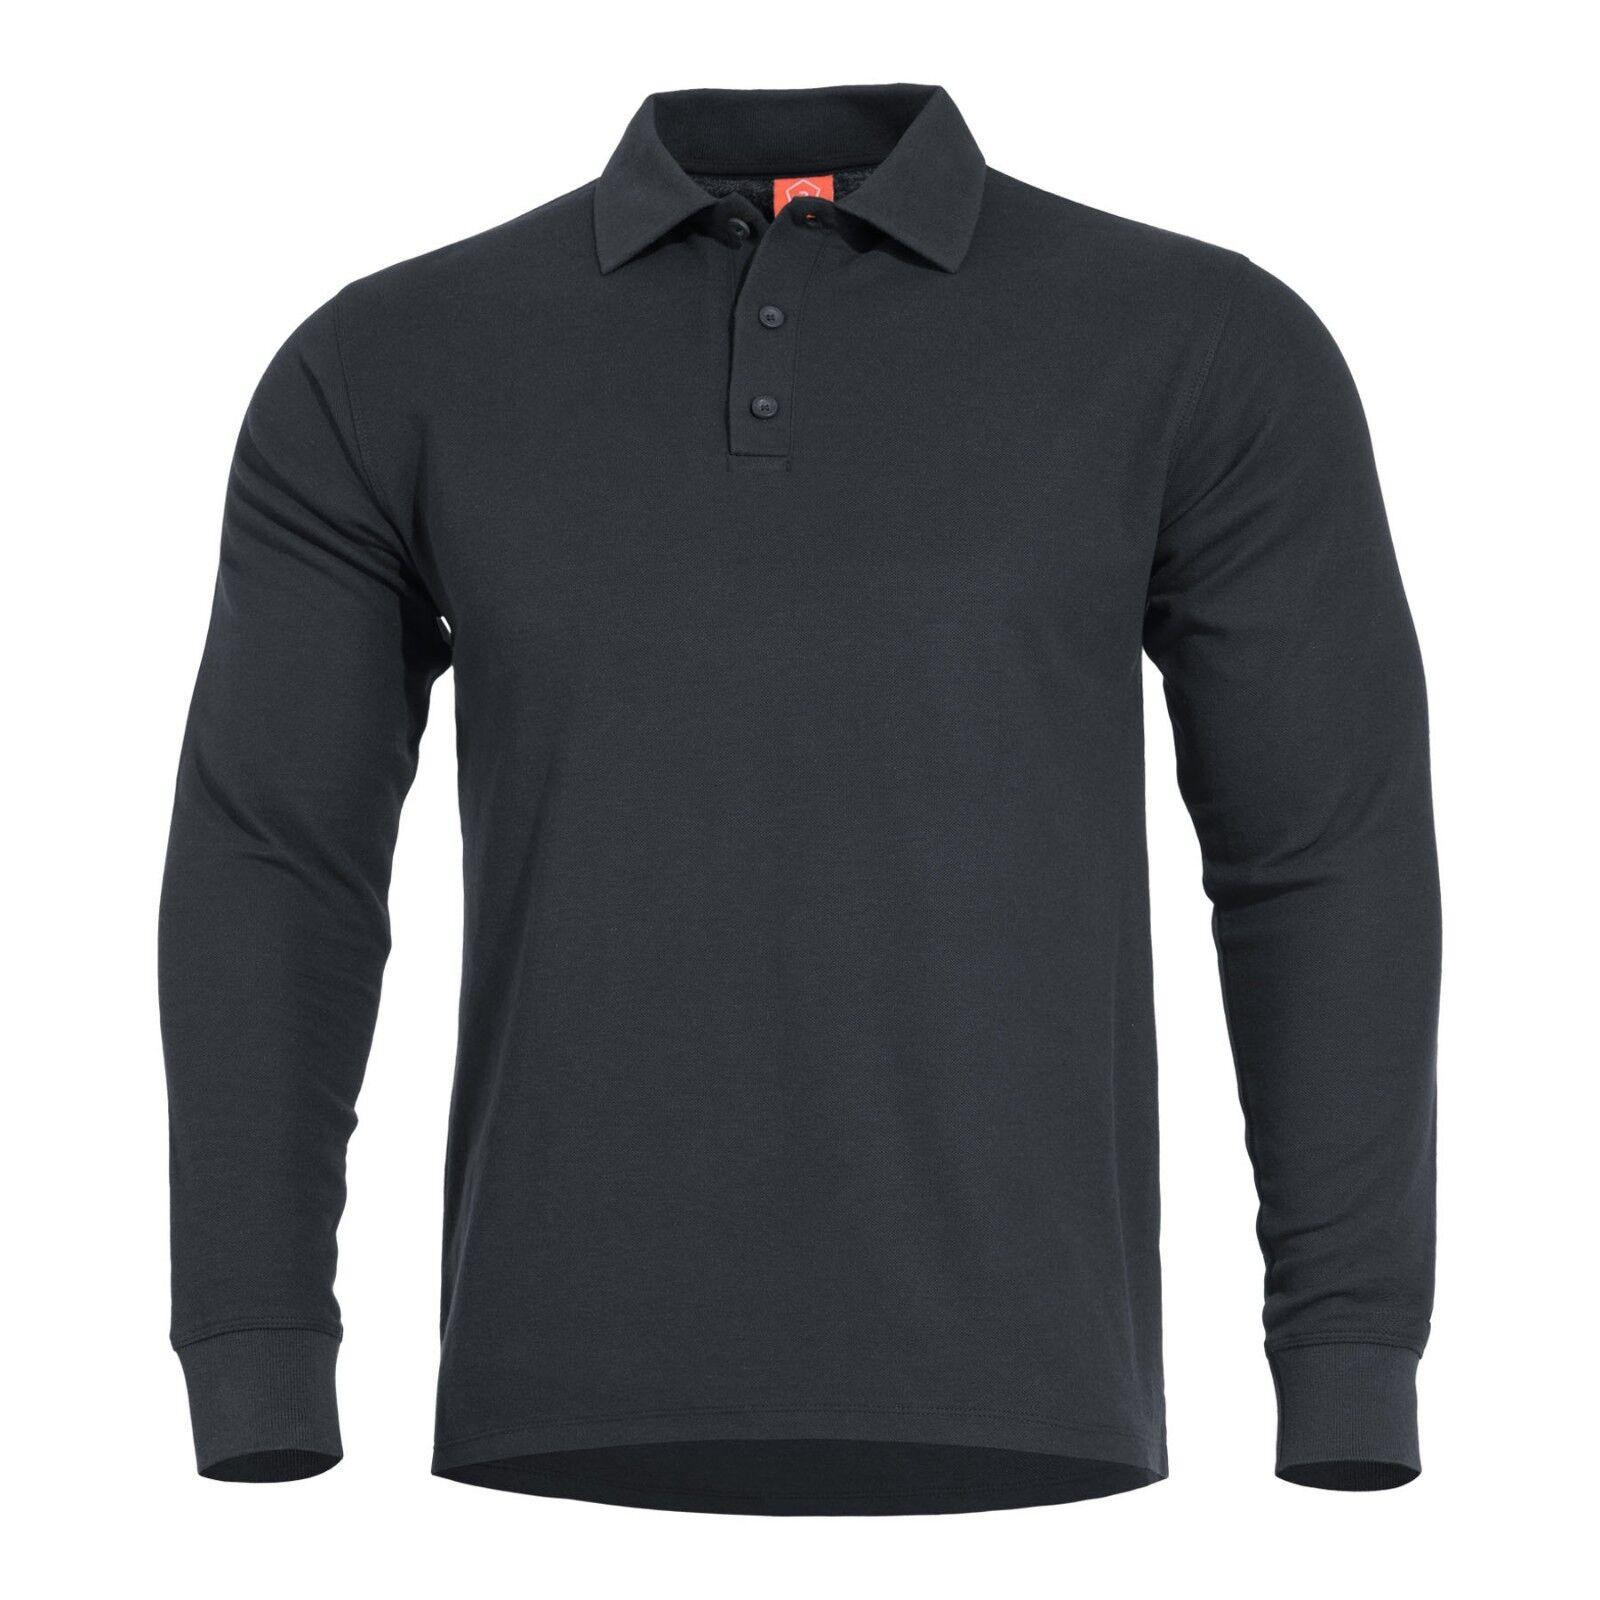 PENTAGON Maglia T-shirt Polo uomo militare Super Soft Pique ANIKETOS POLO nero